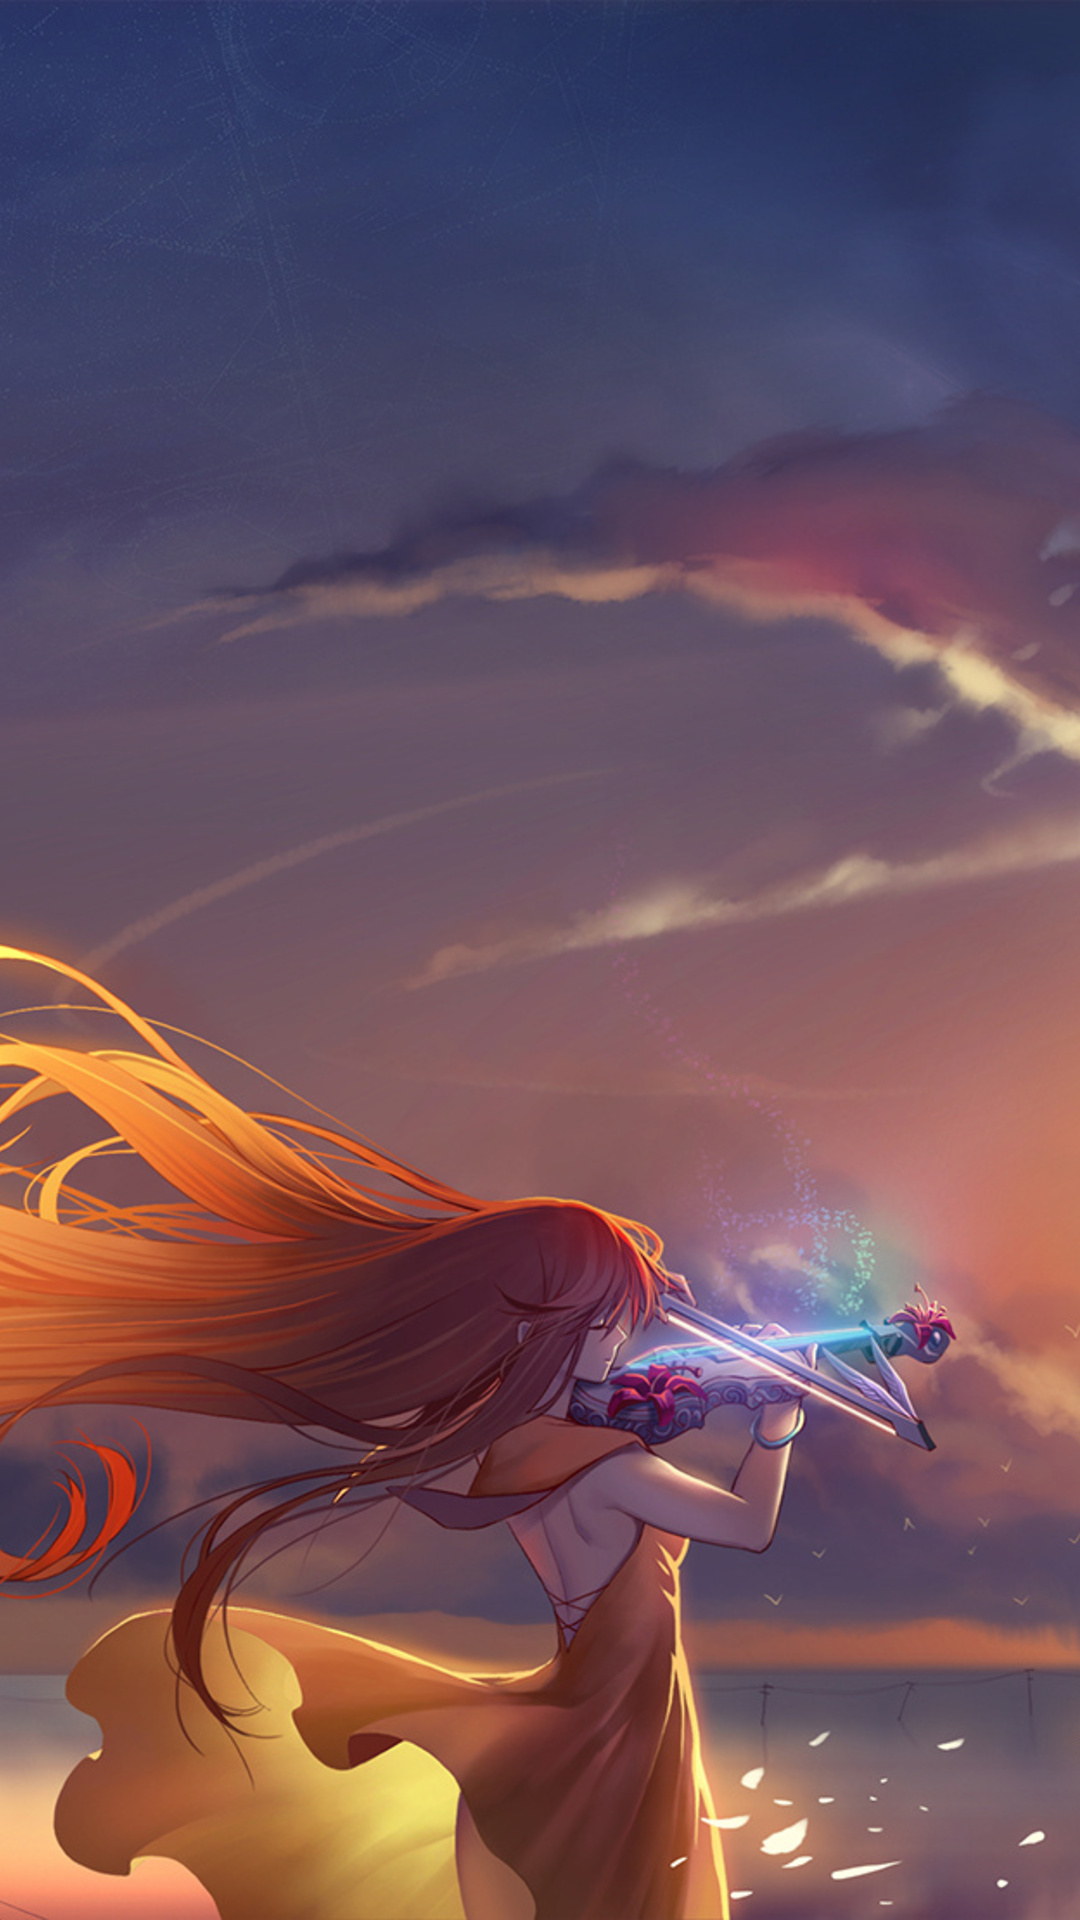 anime-girl-playing-violin-n8.jpg